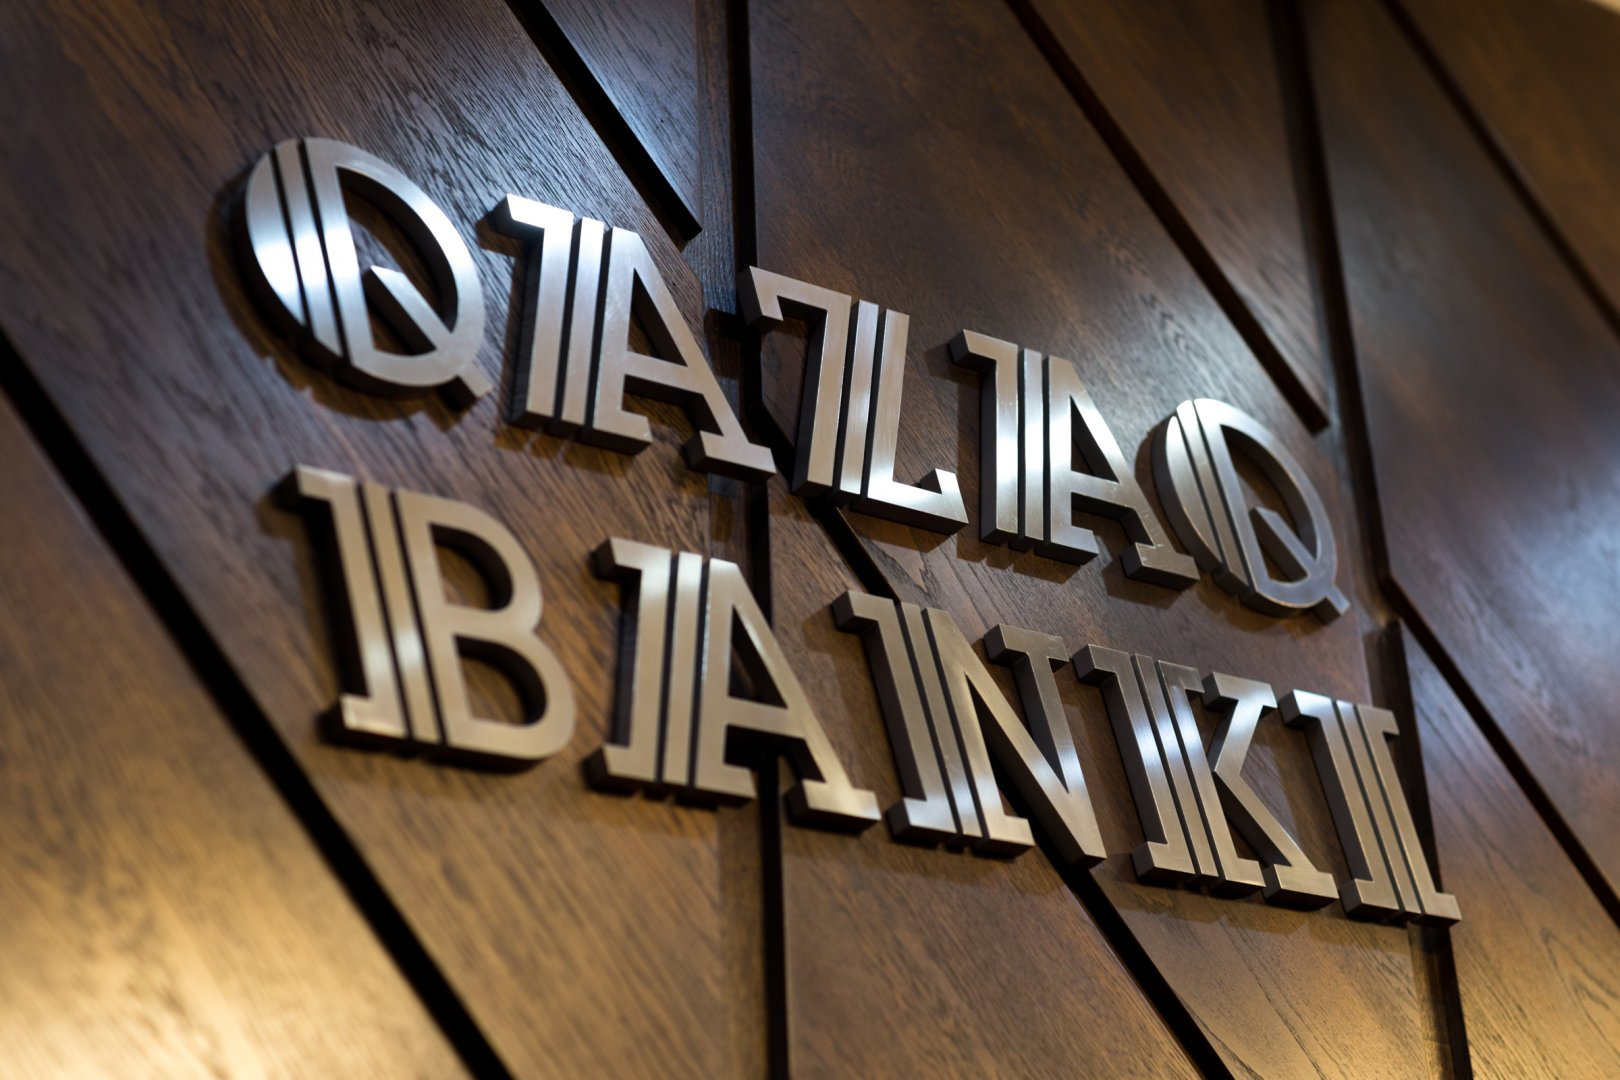 На решение суда о ликвидации Qazaq Banki подана апелляционная жалоба